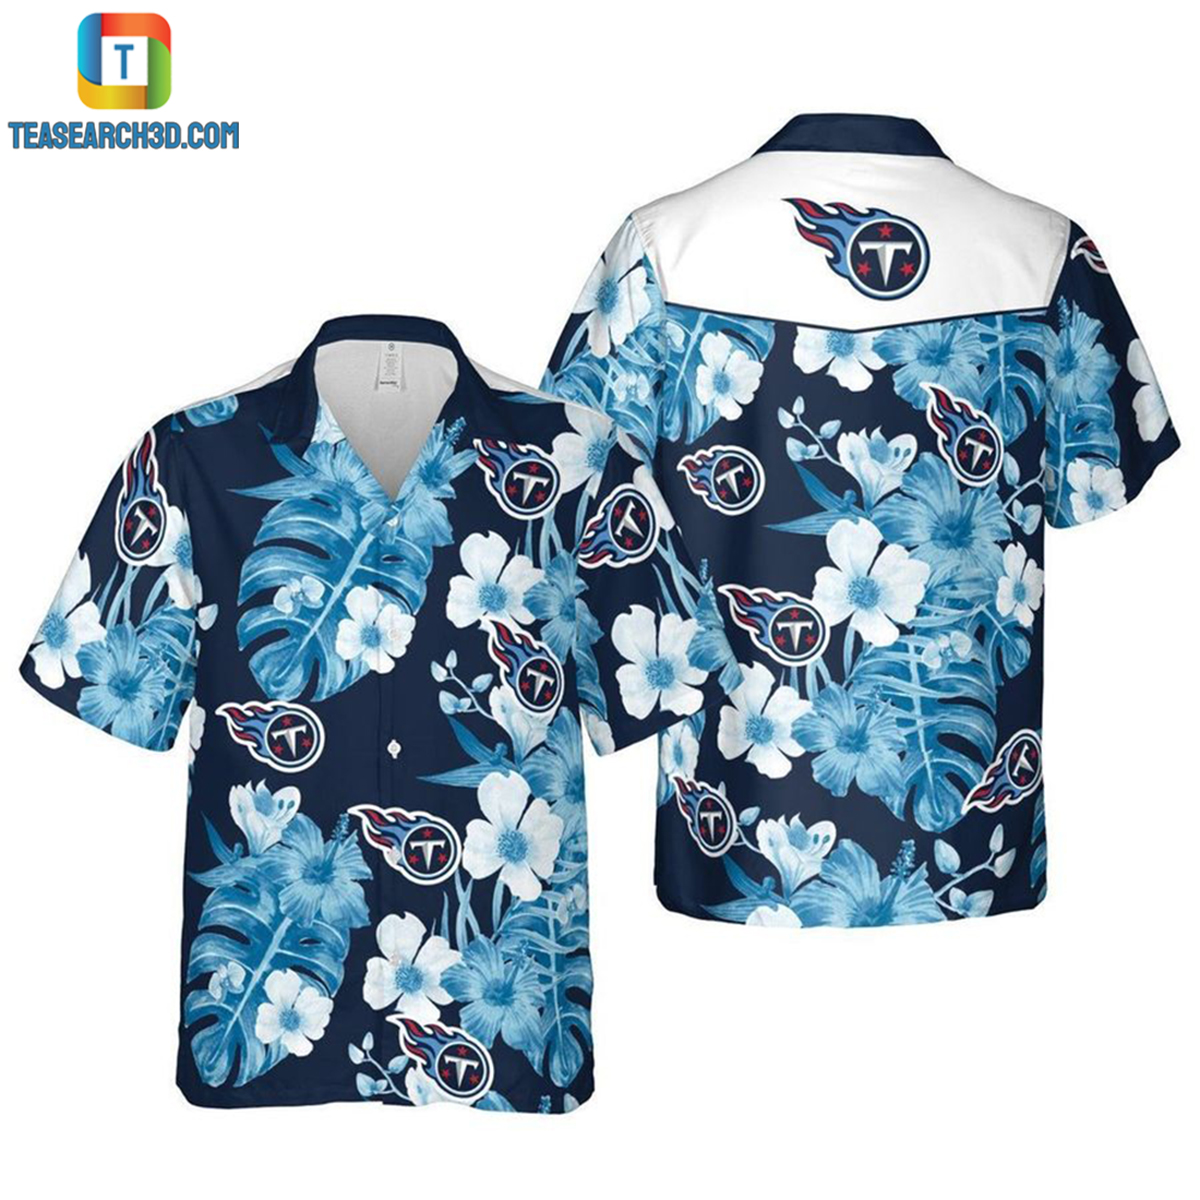 Tennessee titans nfl football hawaiian shirt 2